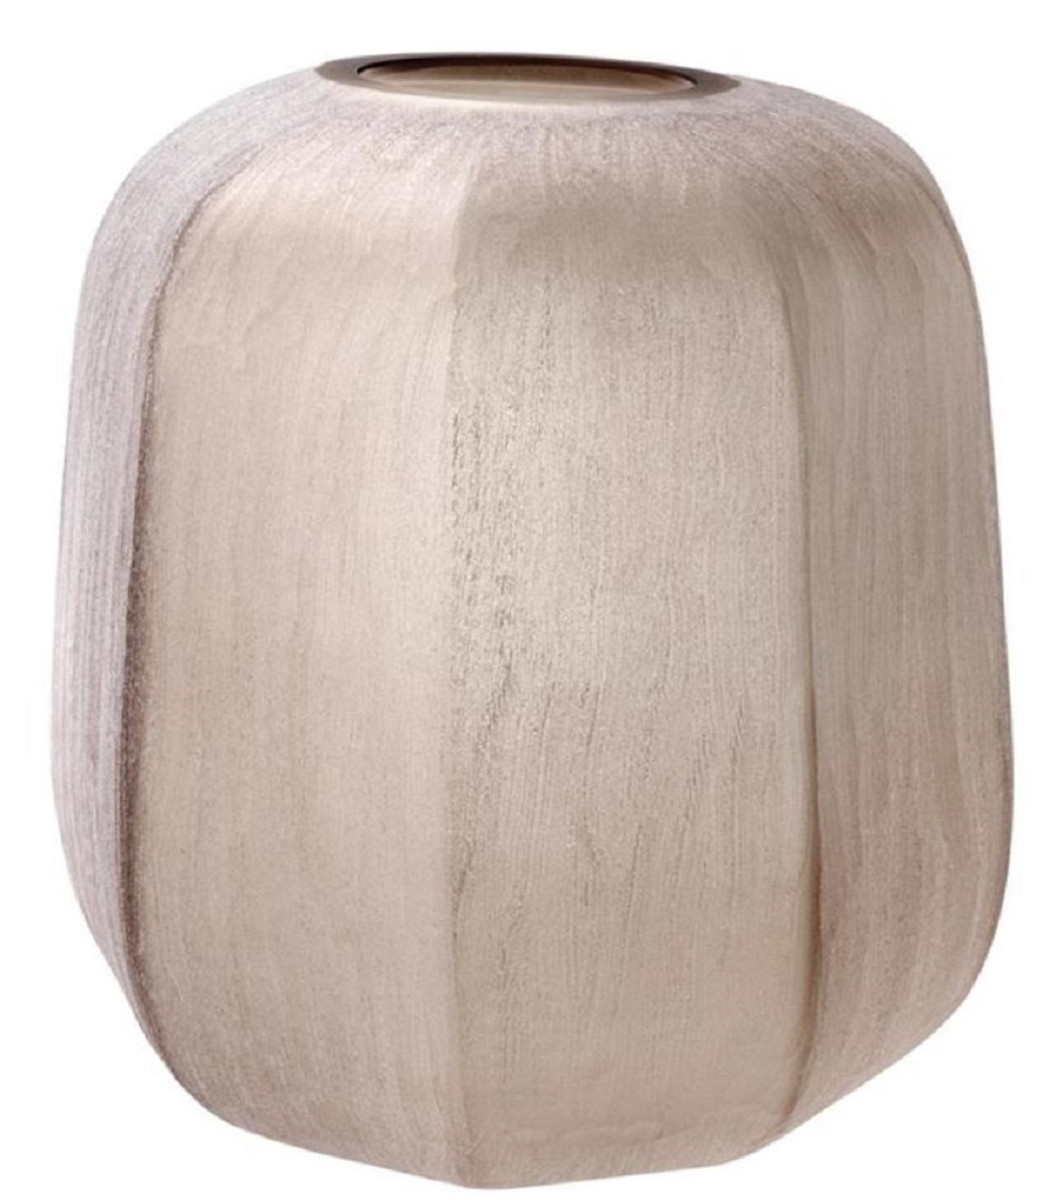 Casa Padrino Luxury Vase Sand Colors O 33 X H 32 Cm Luxury Living